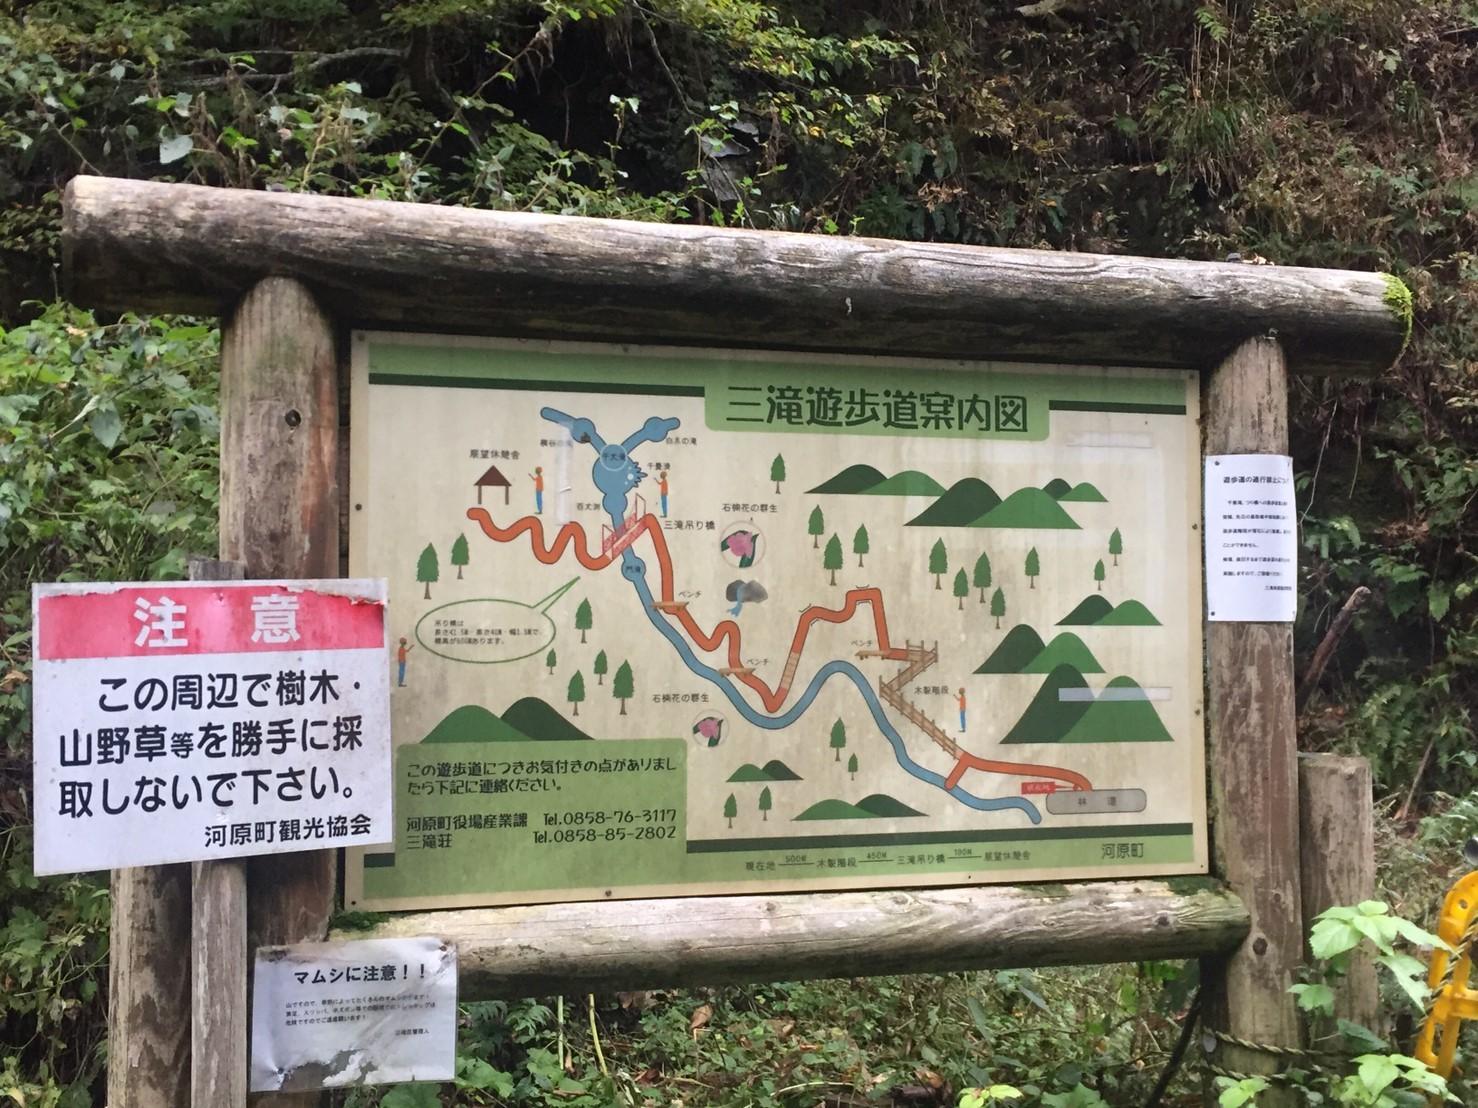 西郷工芸祭り・三滝渓_e0115904_17102557.jpg